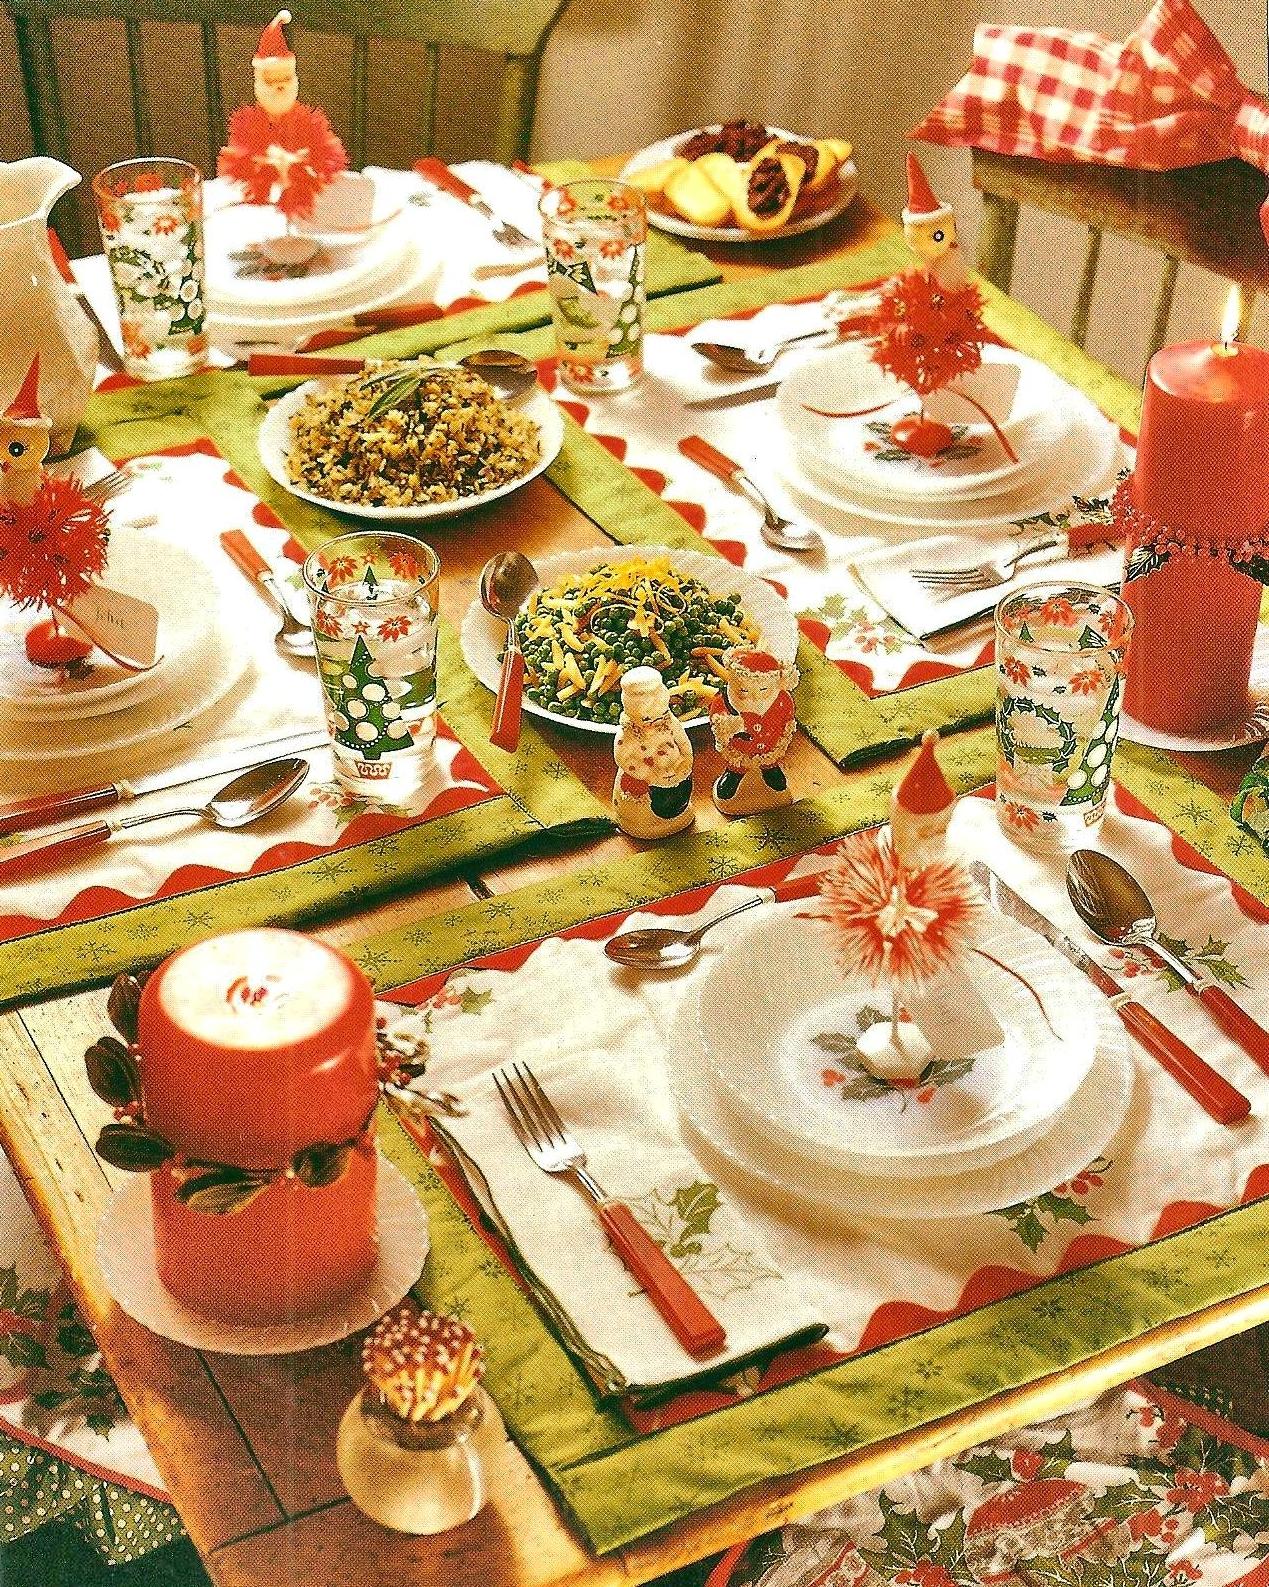 Zetta s Aprons Fun Christmas Table Setting d a Winner